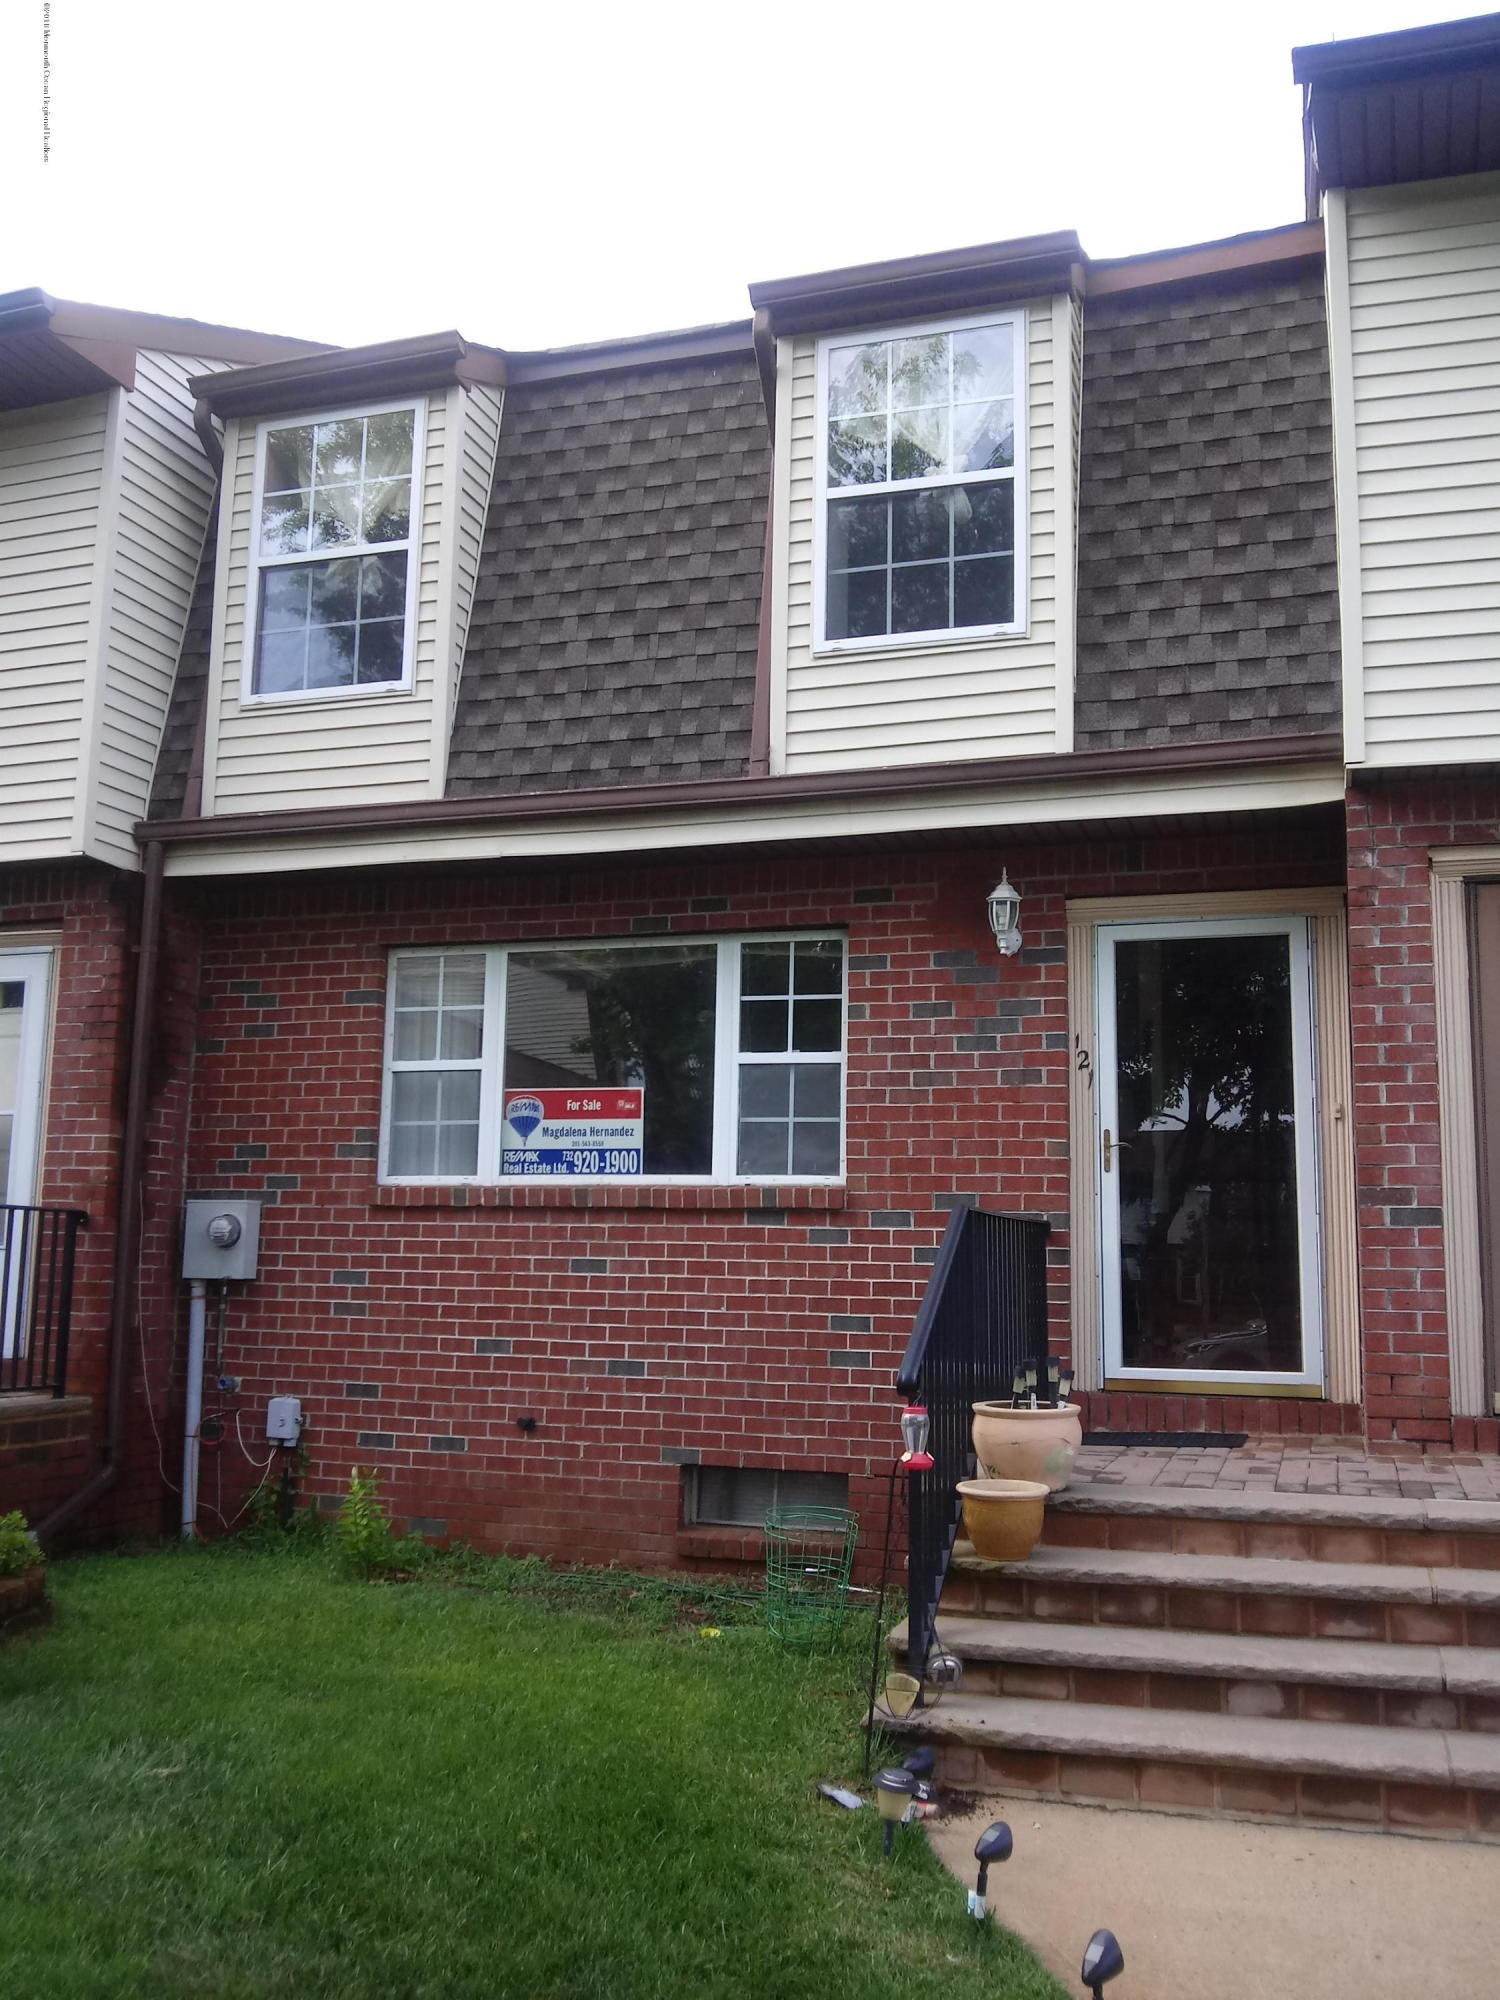 121 Camille Court Brick, NJ - $190,000